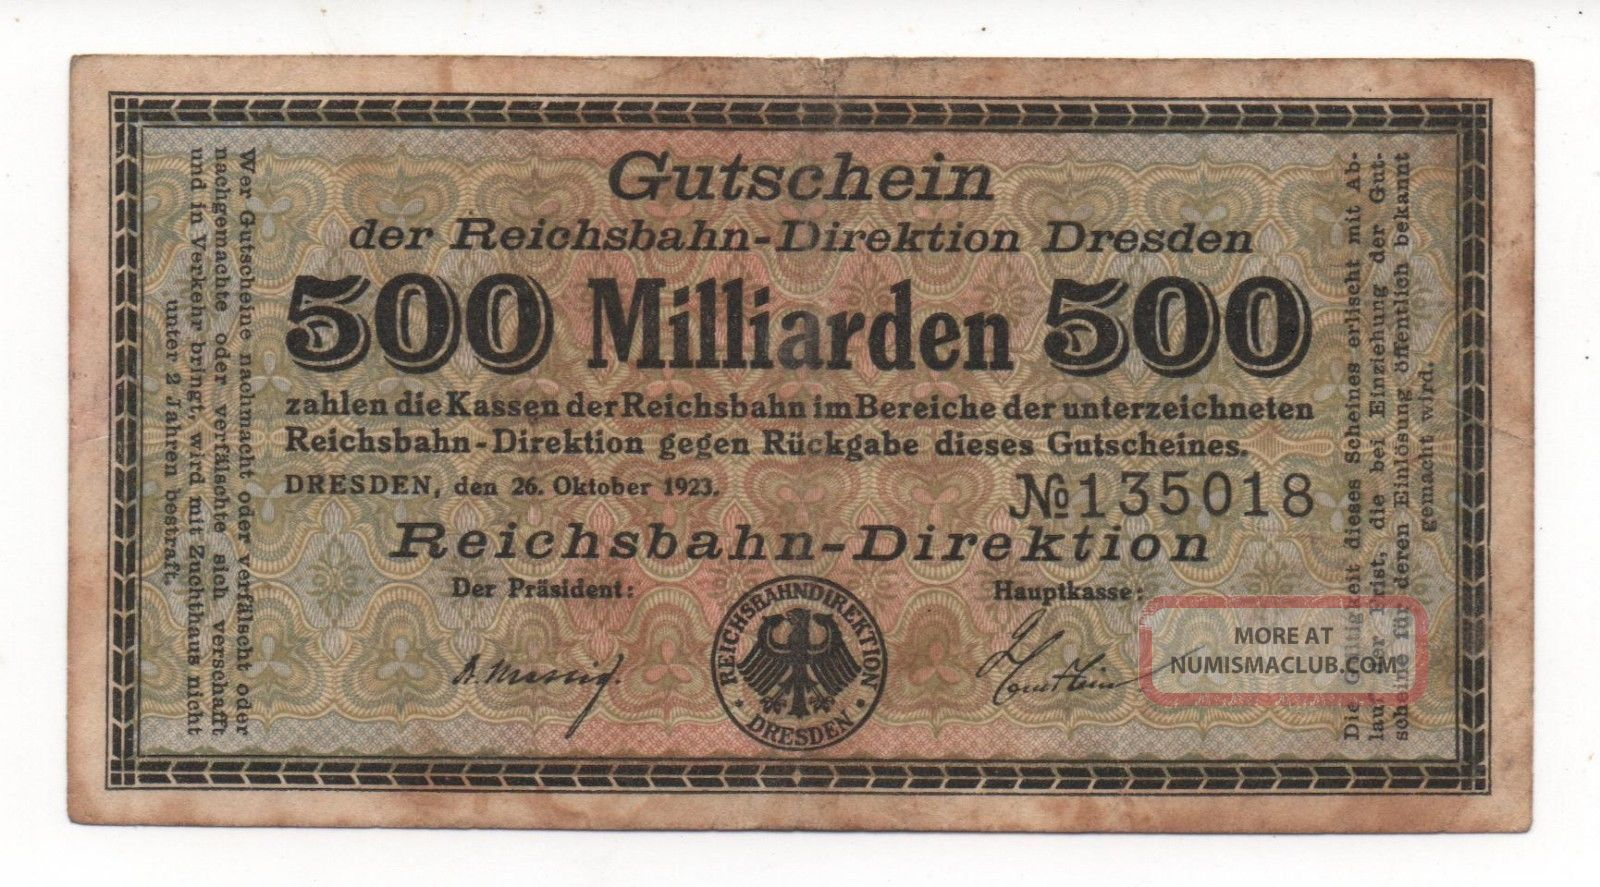 Germany Dresden 500 Milliarden 1923 Notgeld Emergency Money Look Scans Europe photo